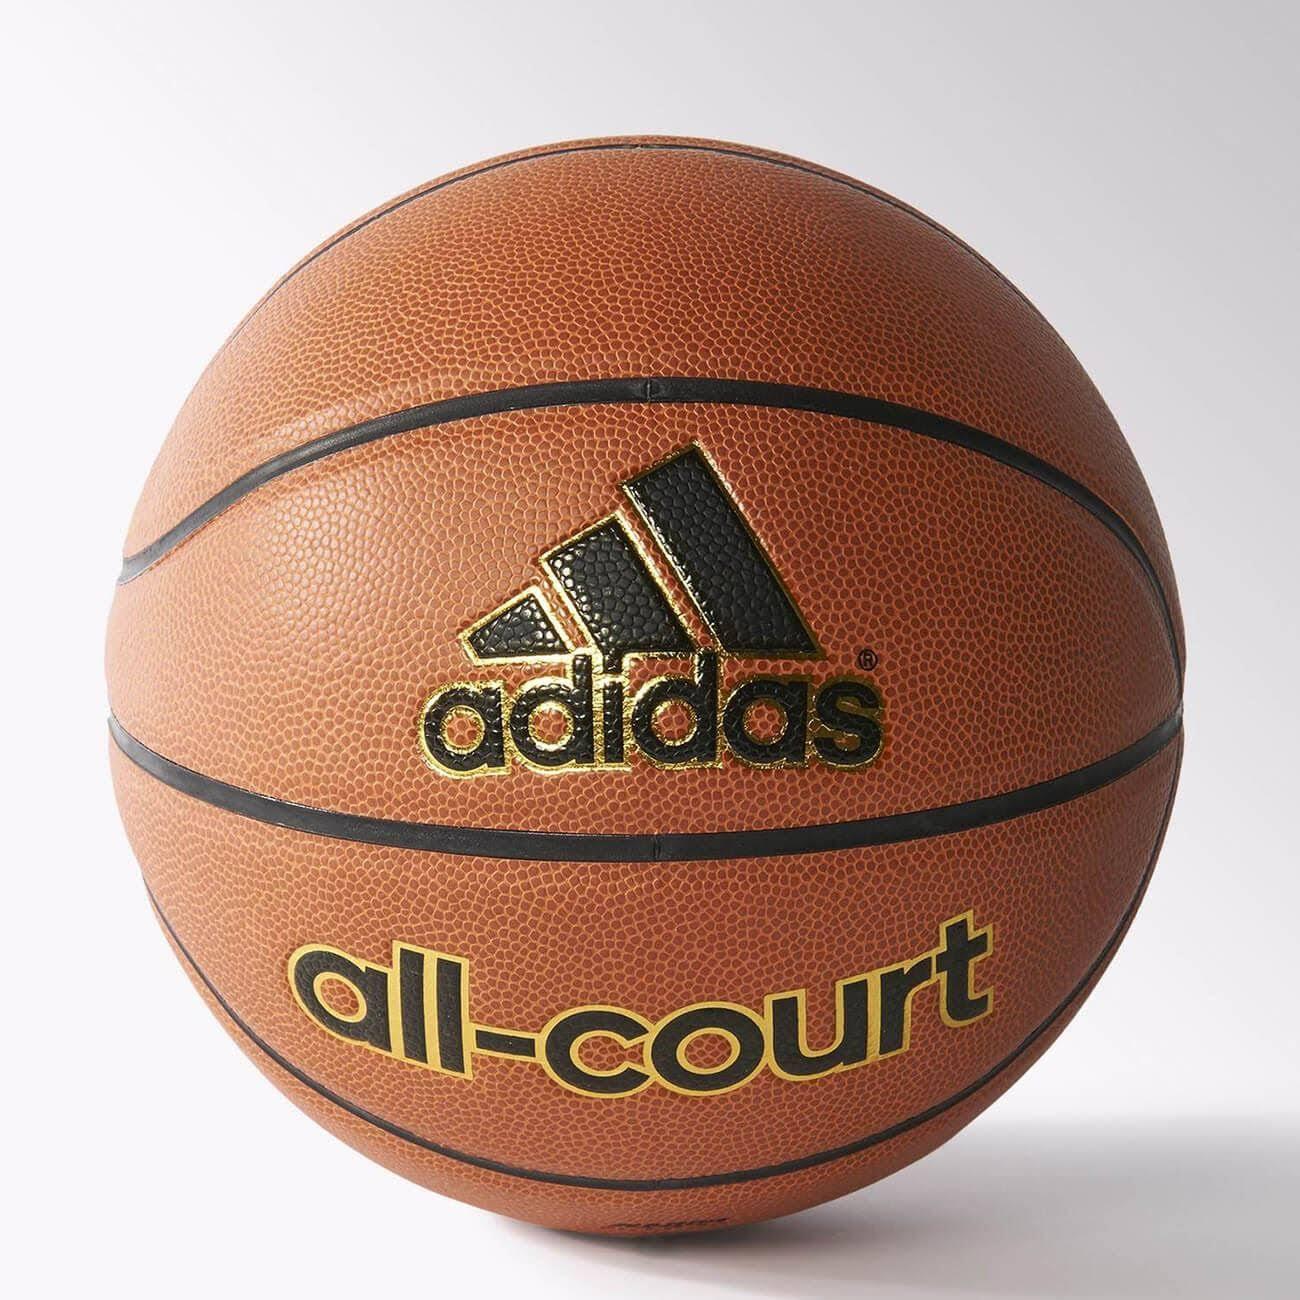 Adidas Basketbol All X35859 Topu 7 No Court qqzSxF